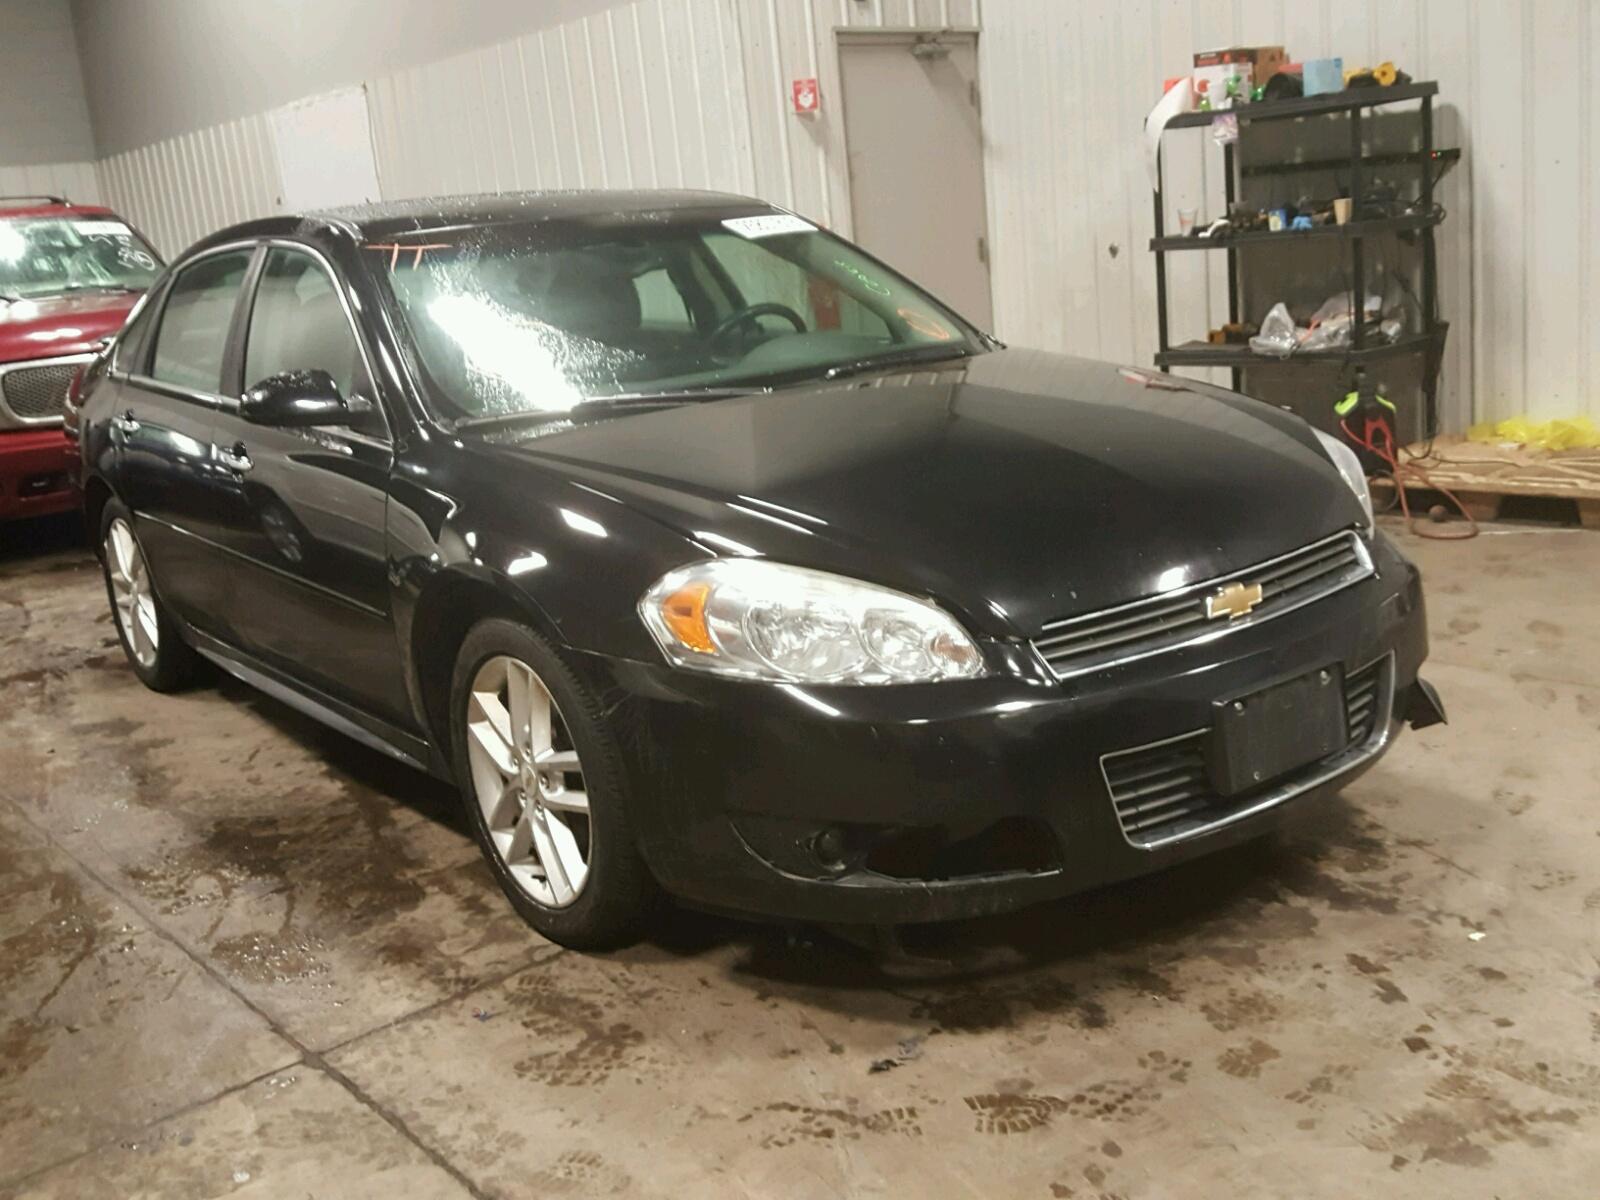 Auto Auction Ended on VIN 2G1WB5EN7A 2010 CHEVROLET IMPALA